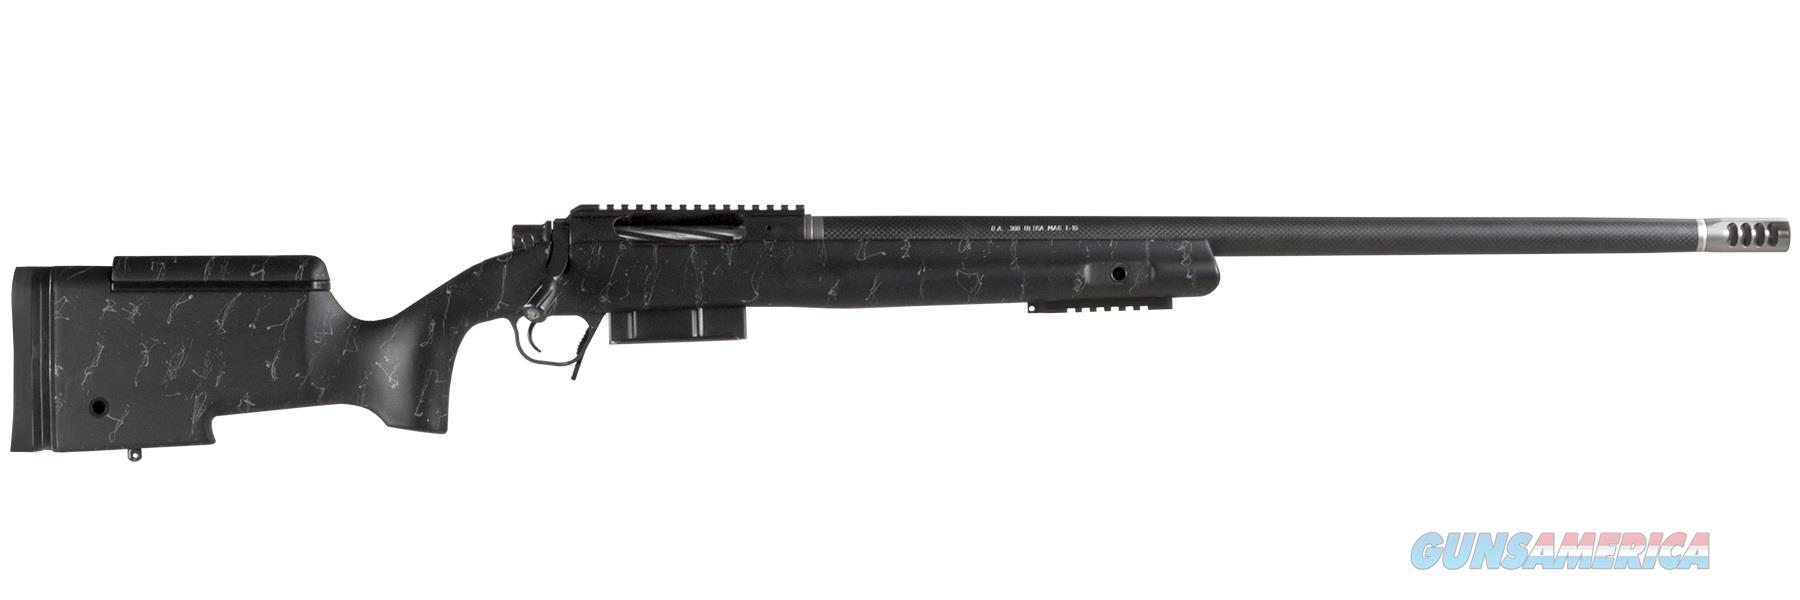 Christensen Arms BA TAC 308WIN BLK/GRY 16 TB CA10271-488481  Guns > Rifles > C Misc Rifles